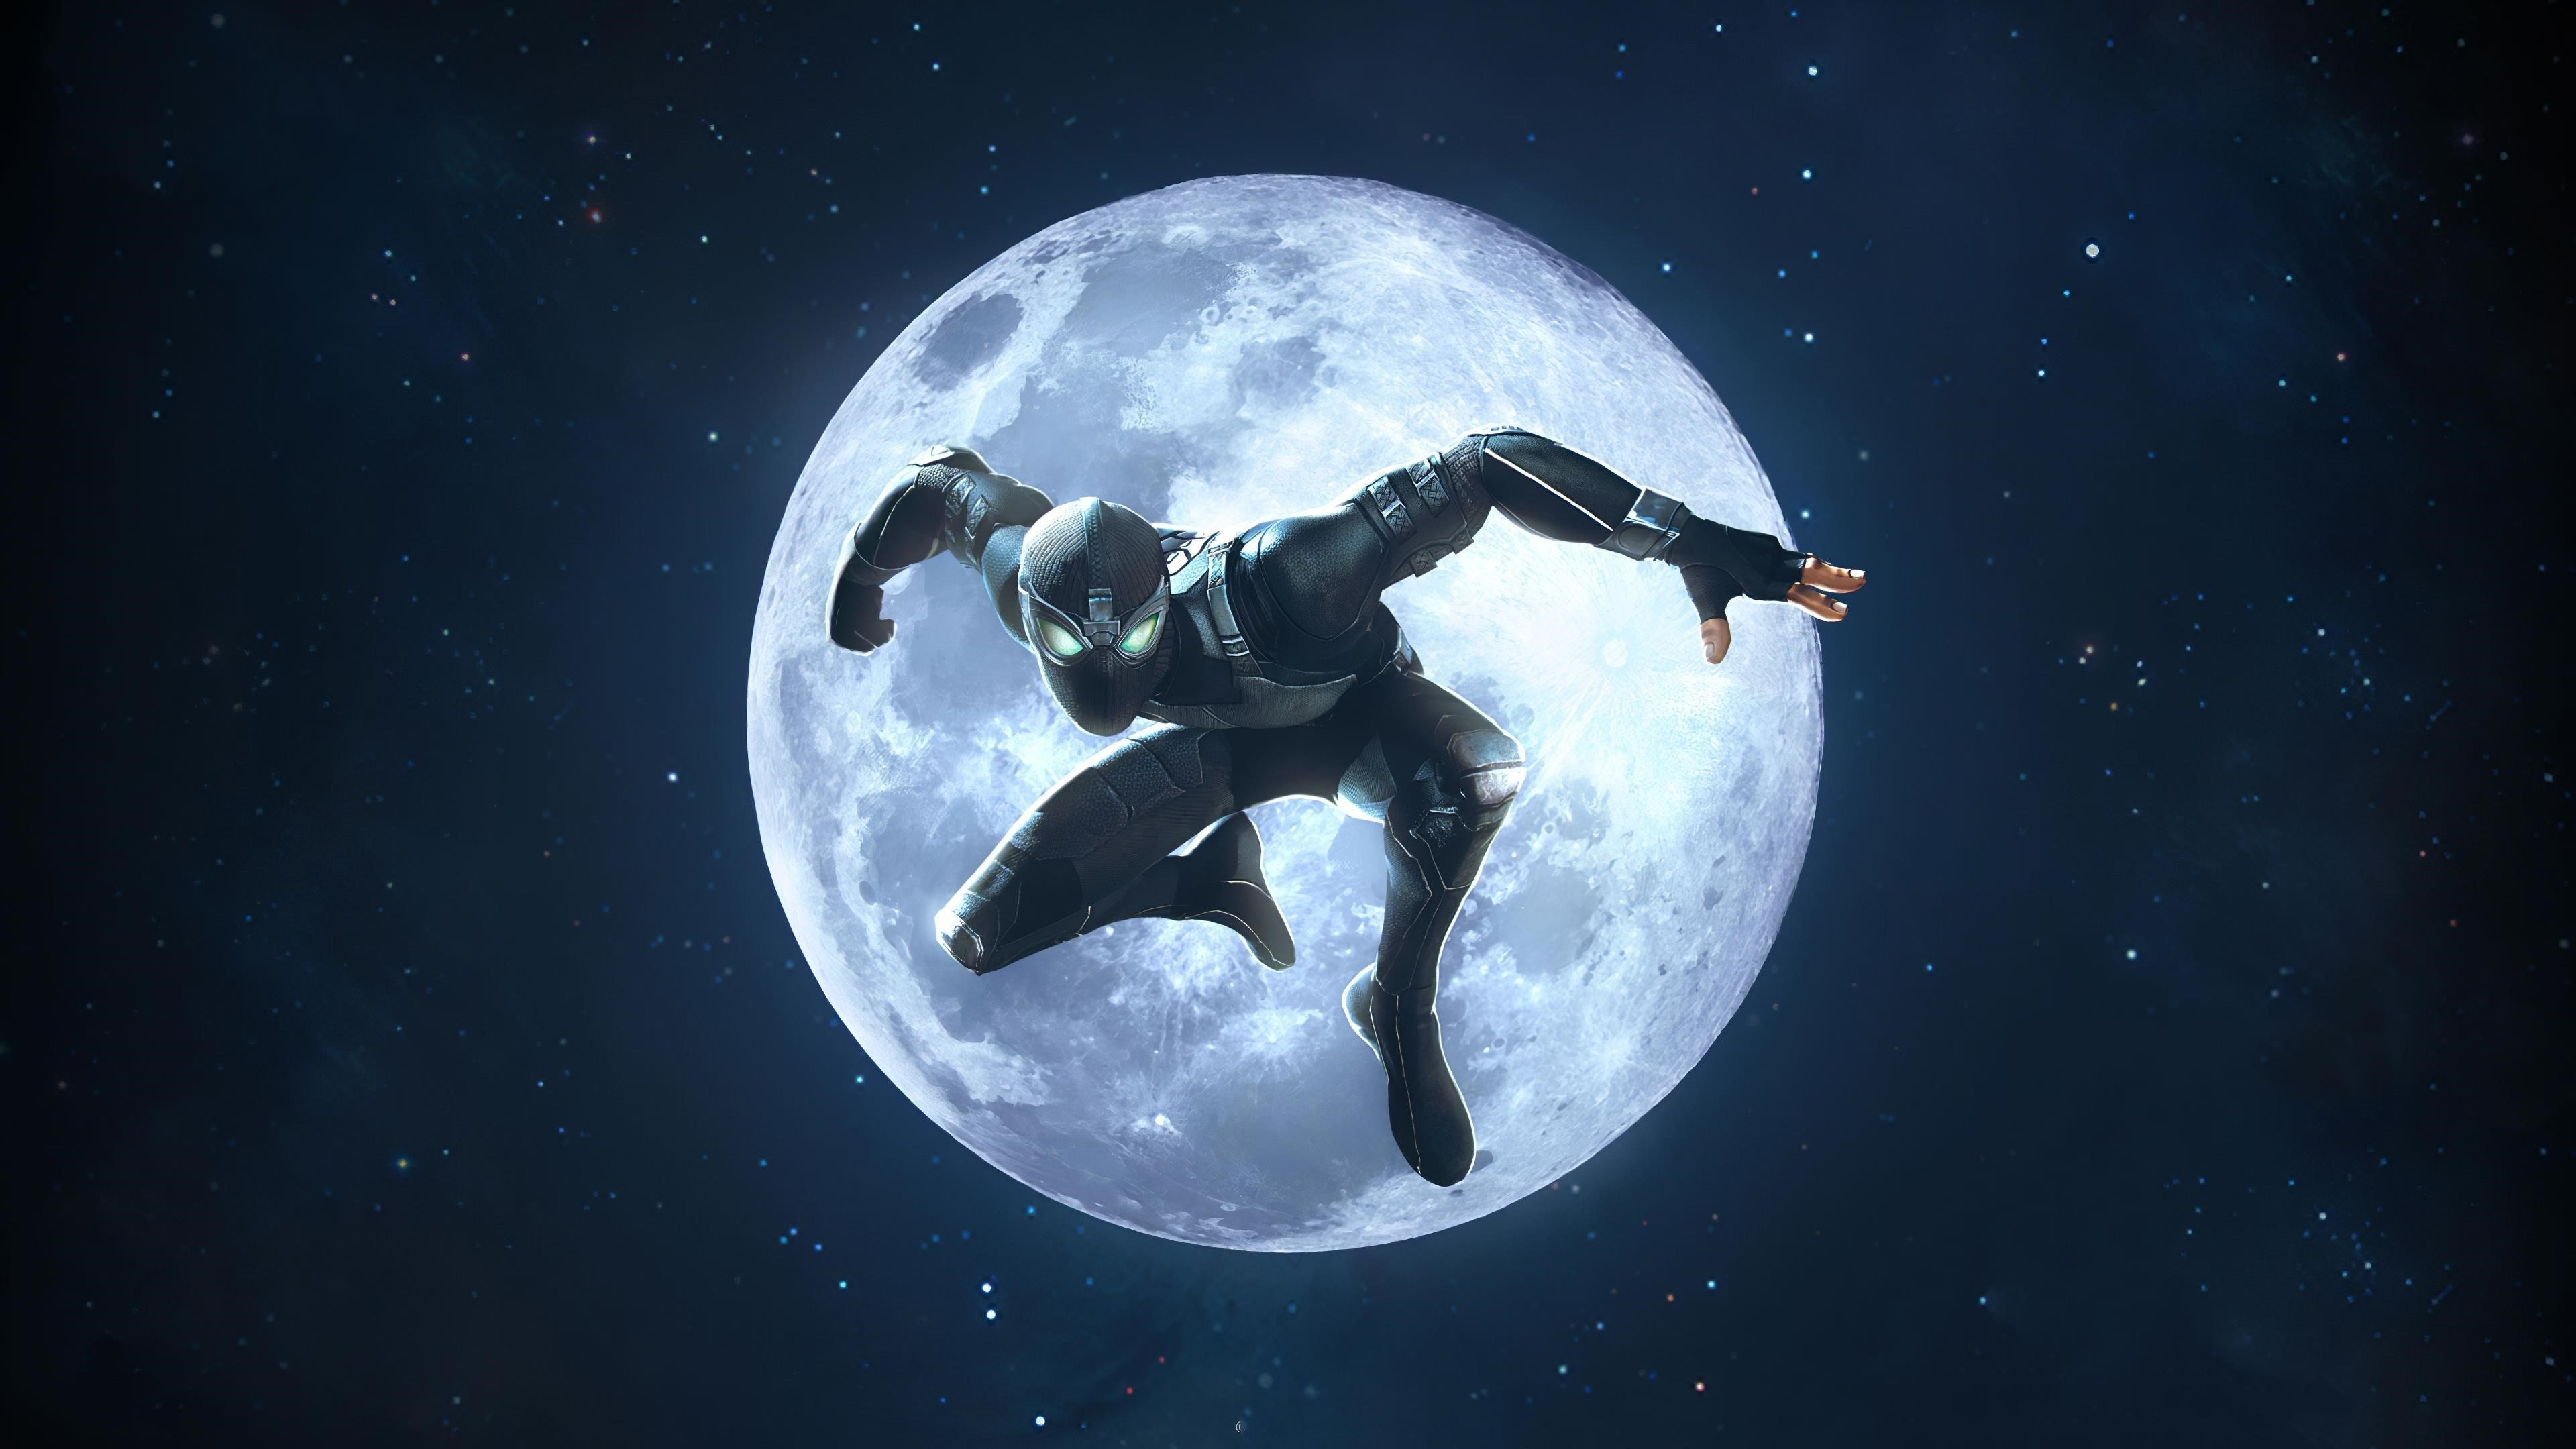 Marvel contest of champions night spider-man обои скачать